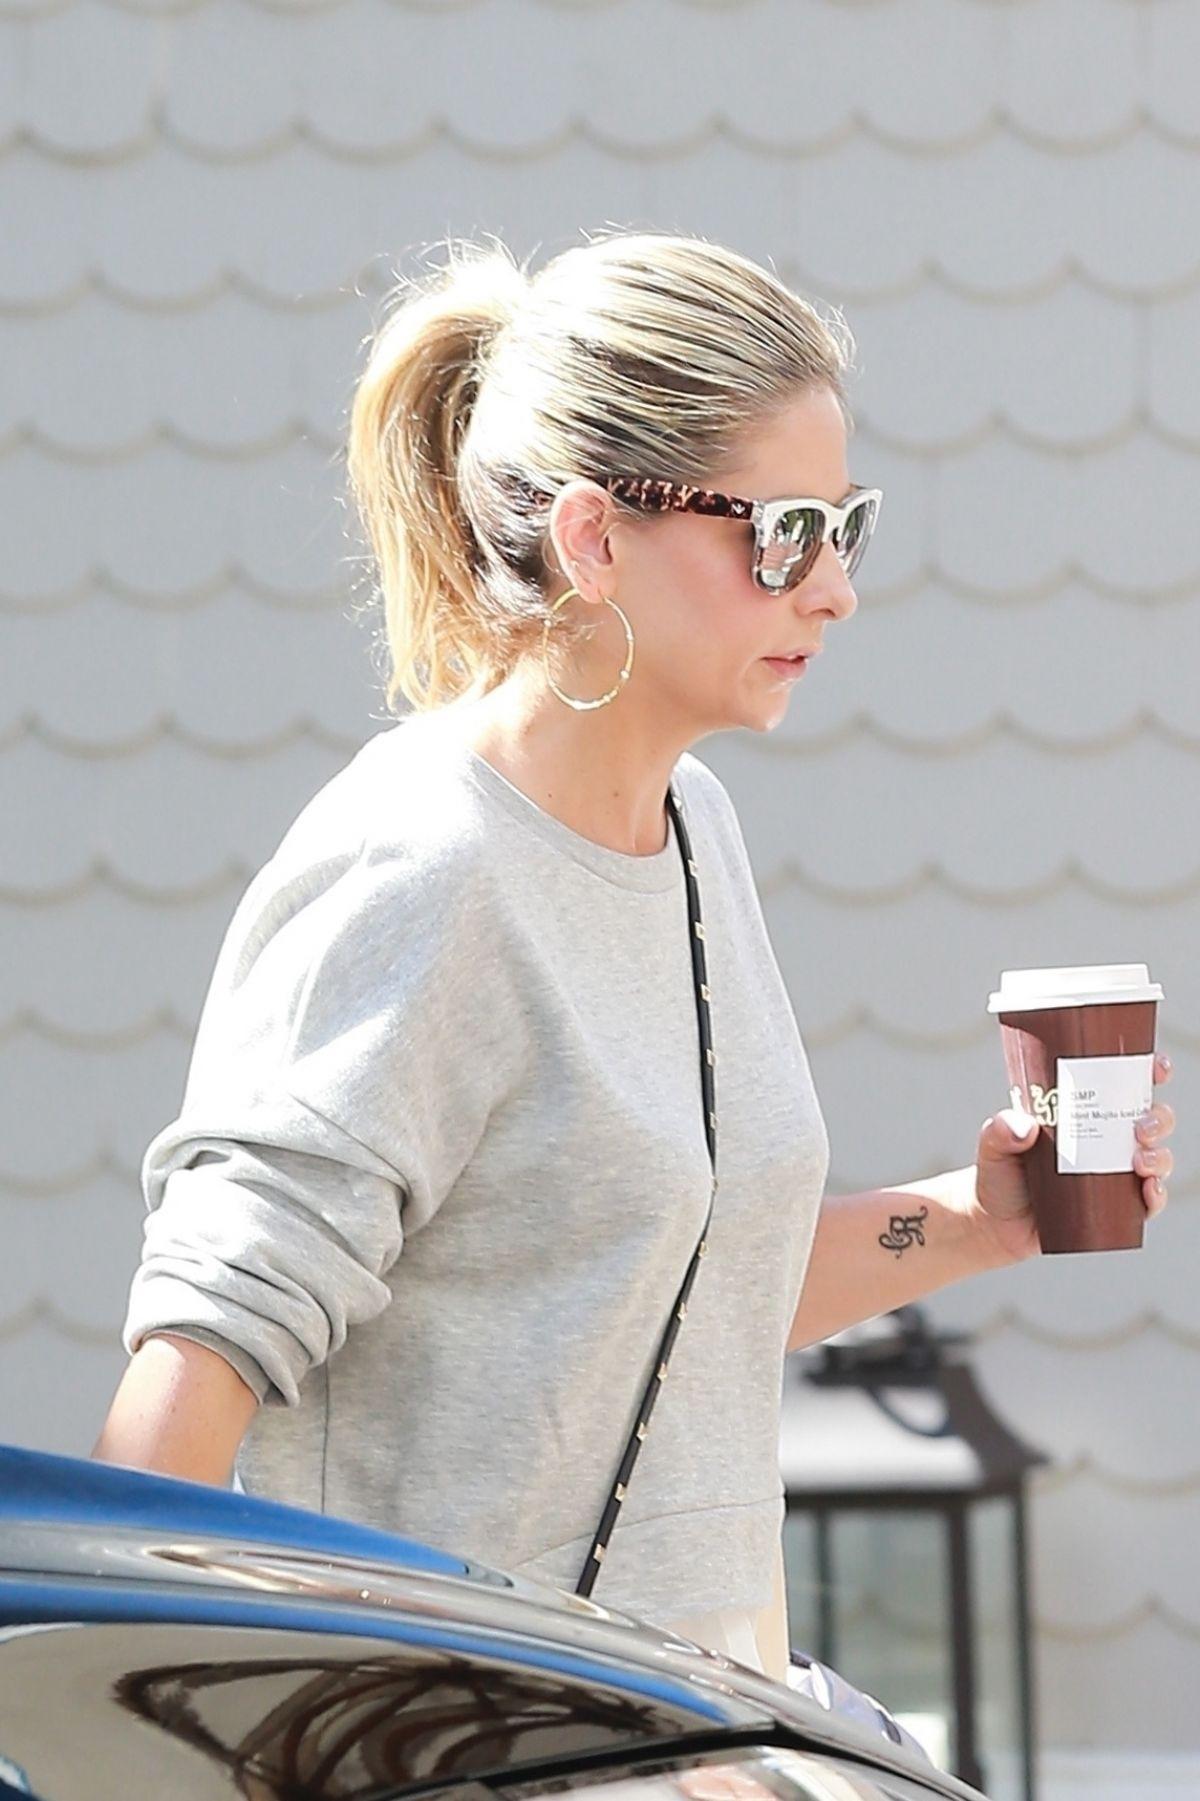 SARAH MICHELLE GELLAR Out for Coffee in Santa Monica 09/21/2017